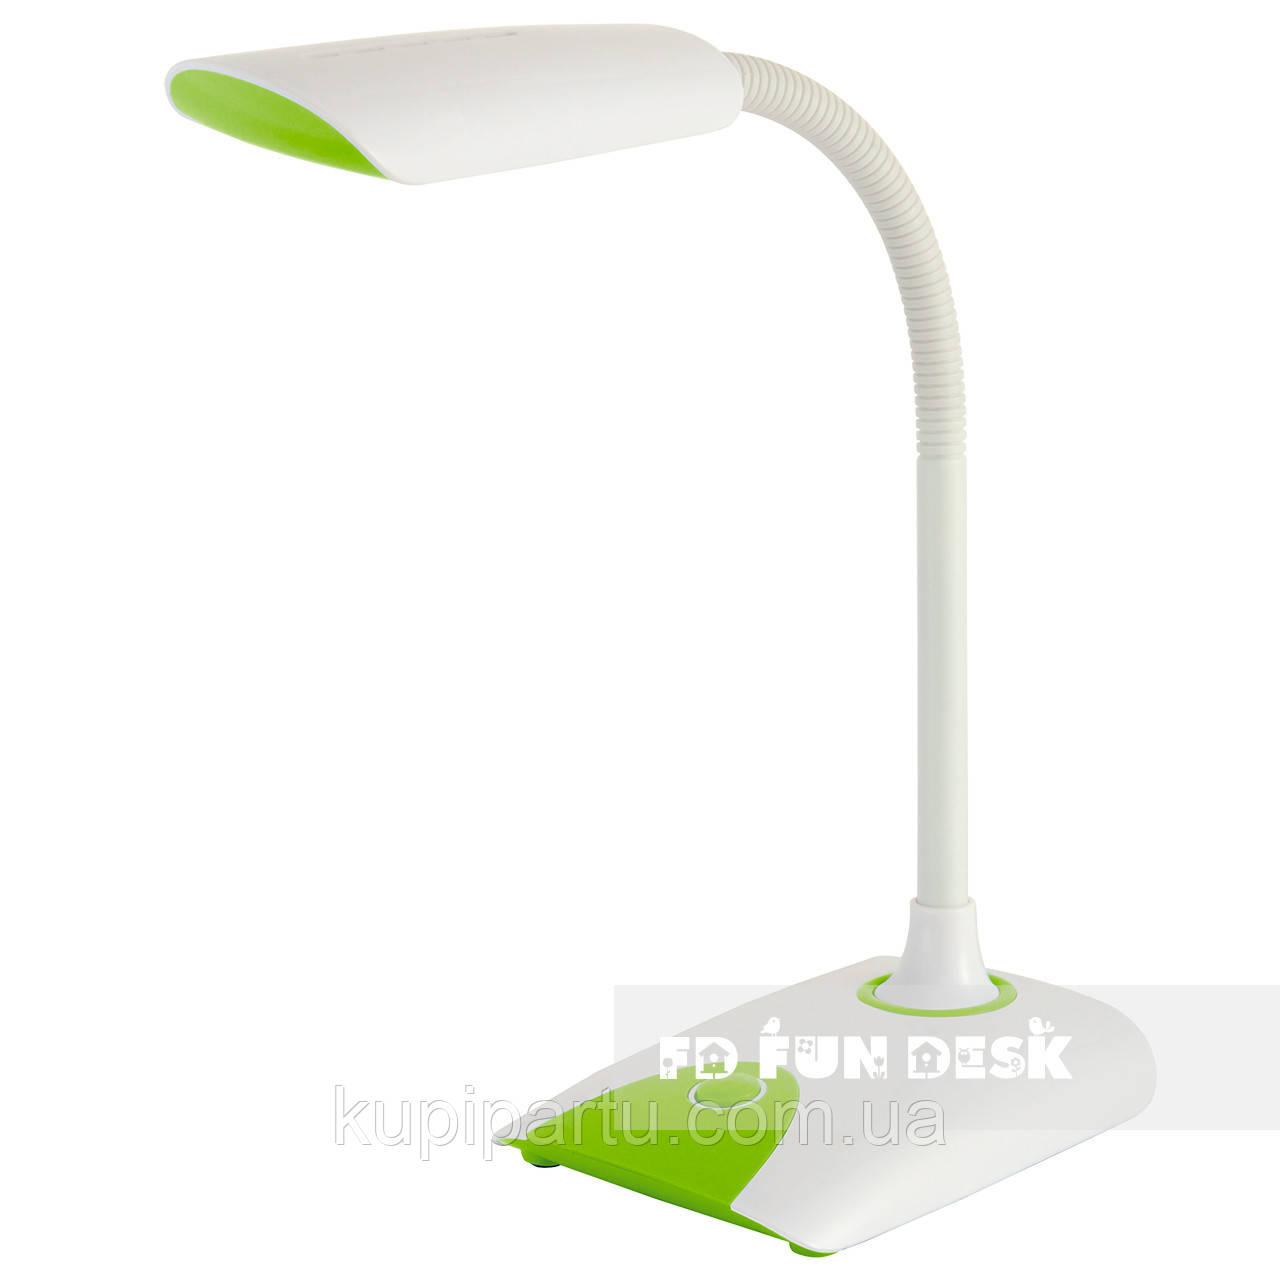 Настольная светодиодная лампа FunDesk LS2 green